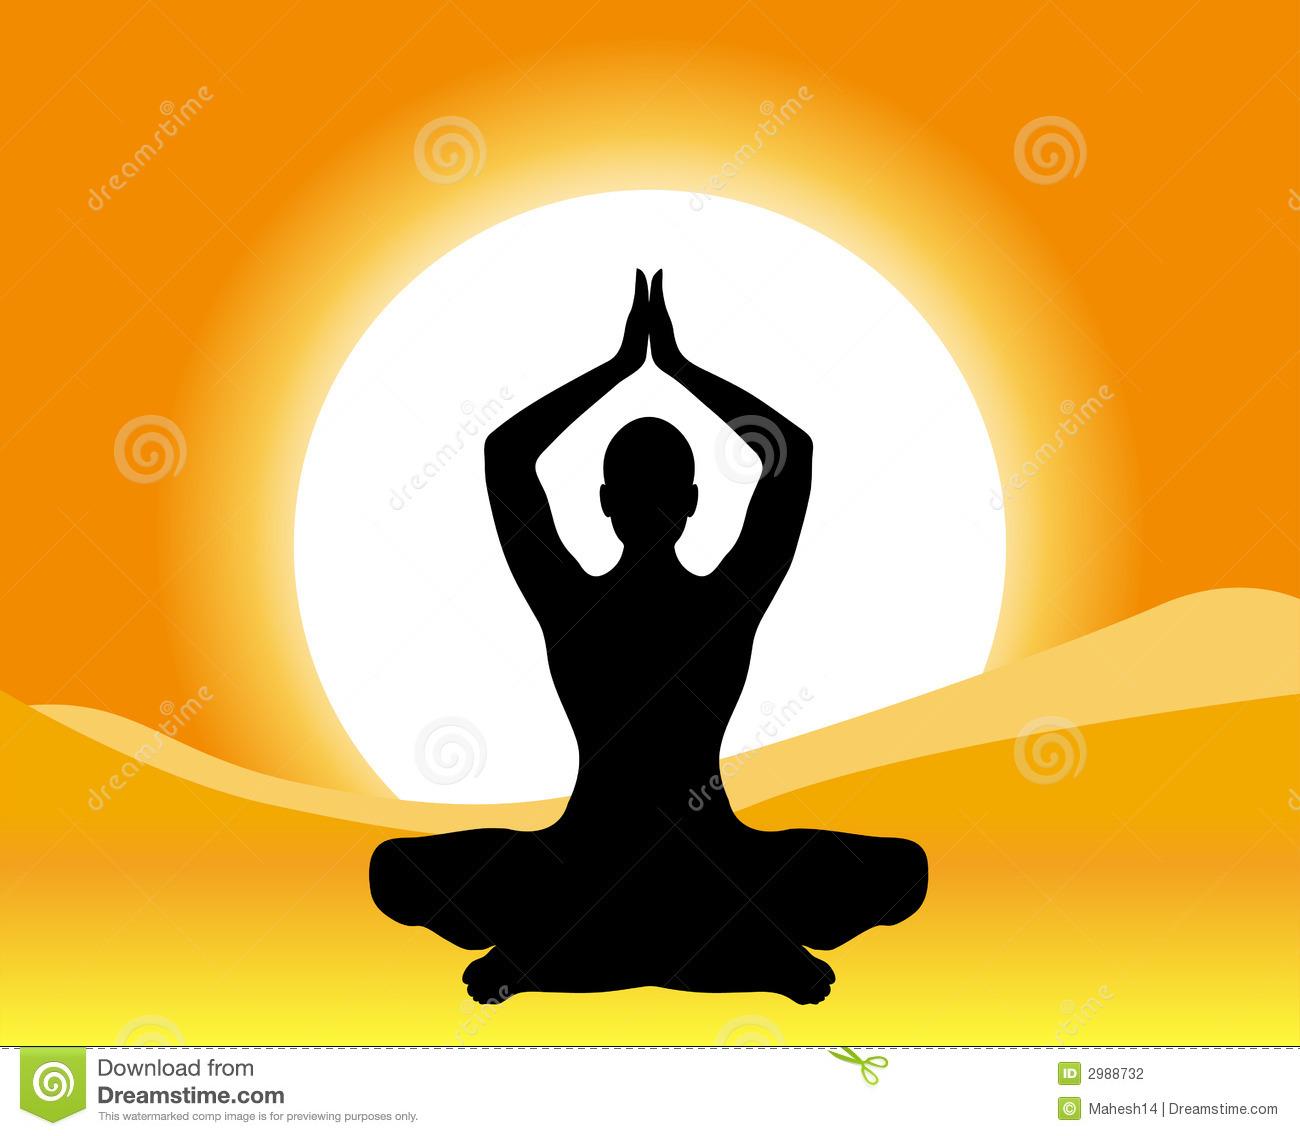 1300x1136 Meditation Silhouette Clipart